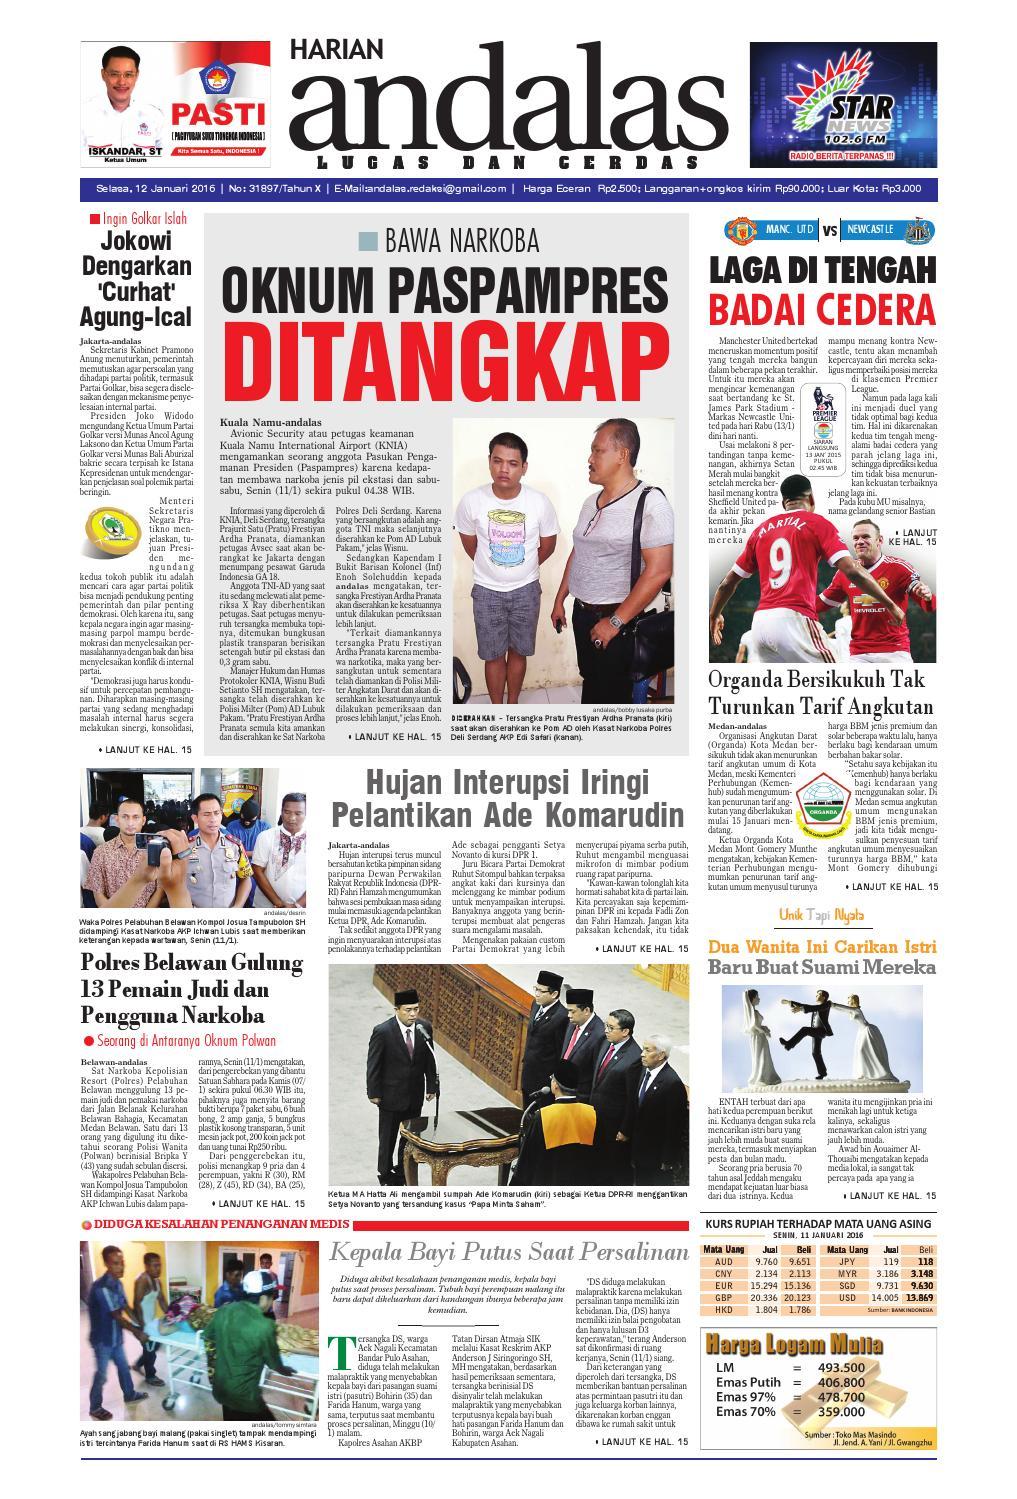 Epaper andalas edisi selasa 12 januari 2016 by media andalas - issuu 470a1fef63